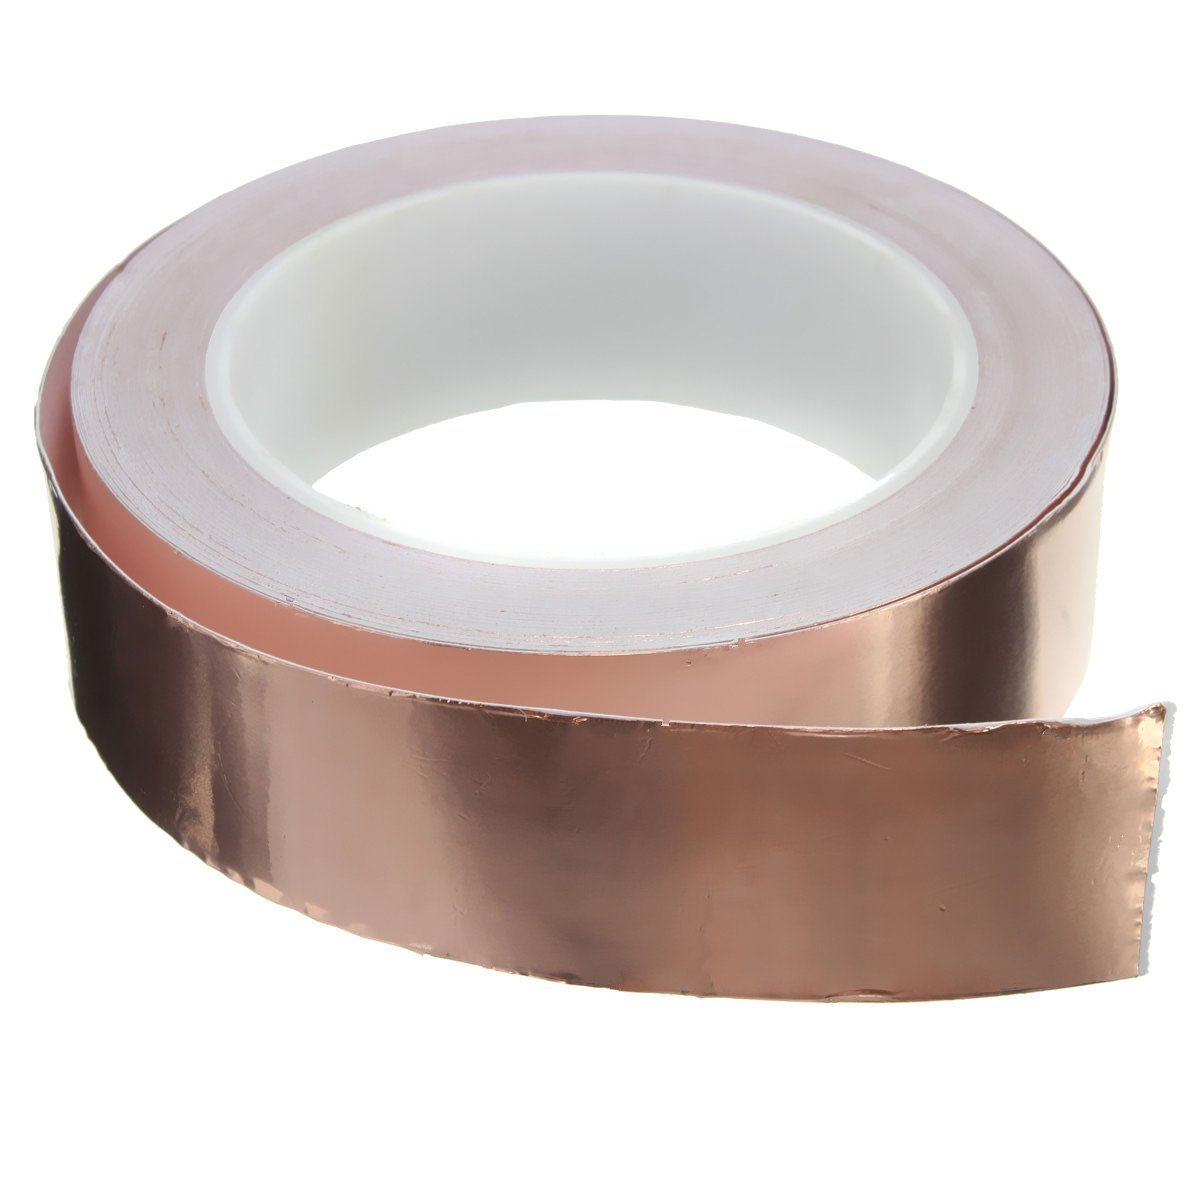 30mmx20m EMI Abschirmband Kupferfolie Kupferband Selbstklebend Klebeband